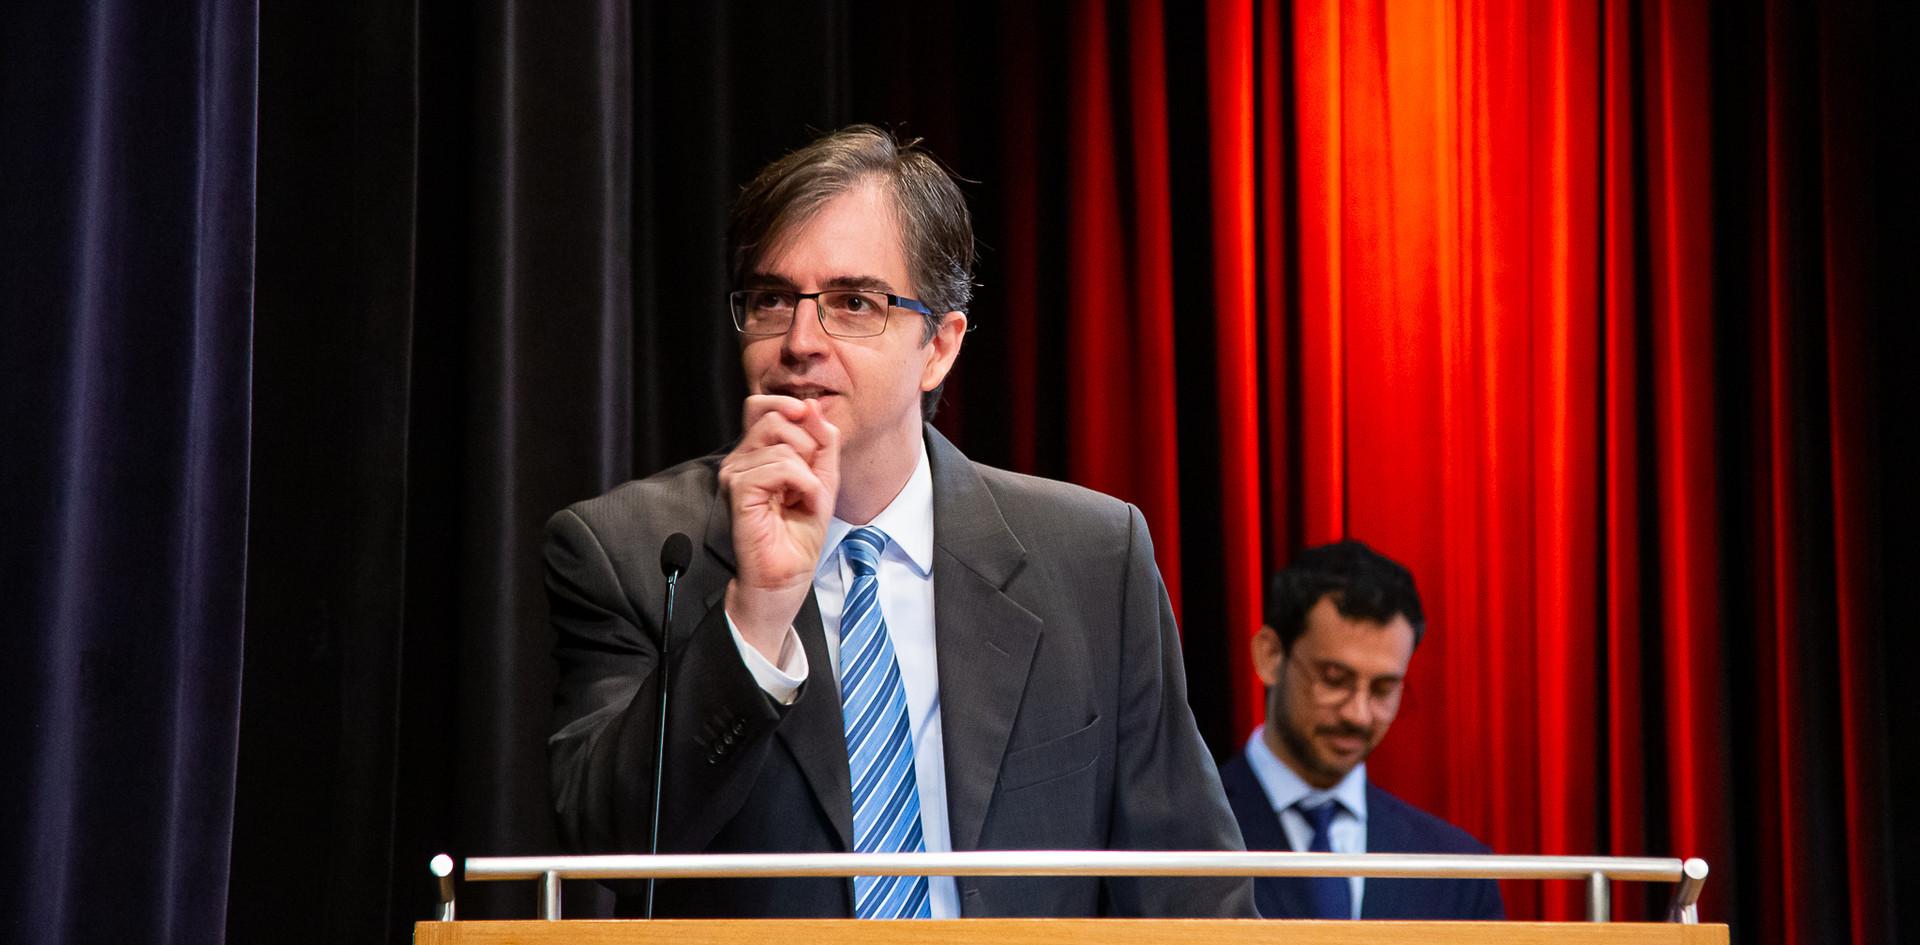 Carlos Motta Nunes